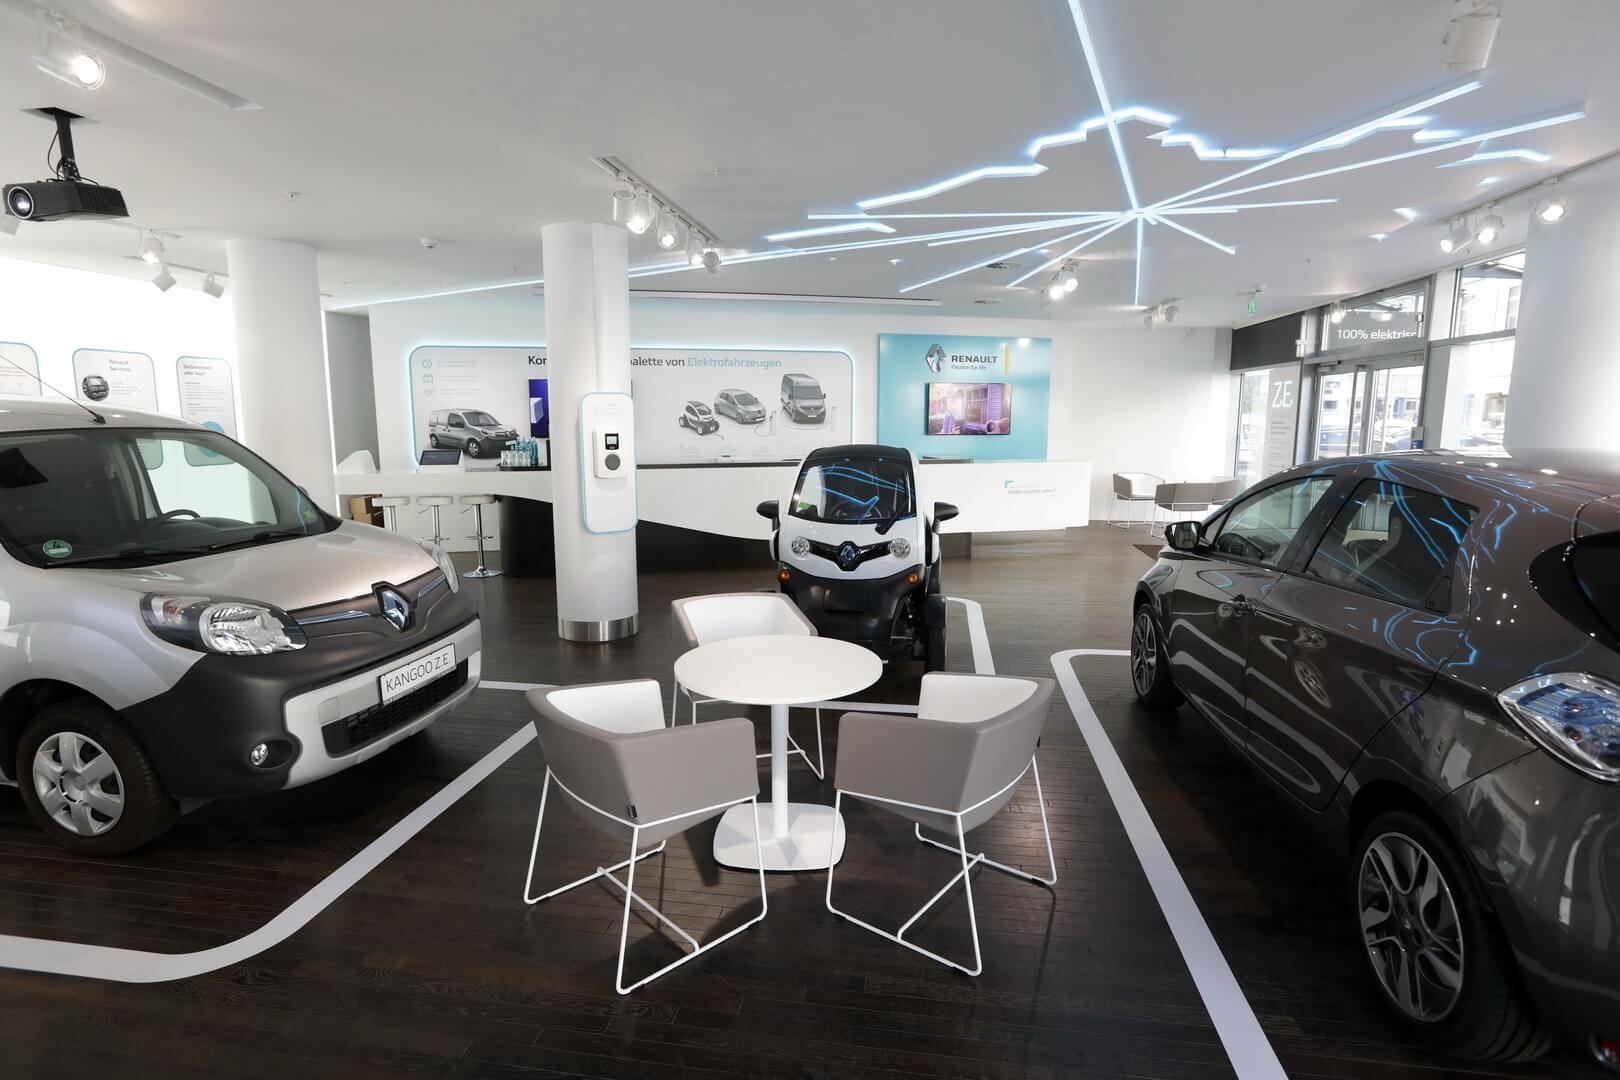 Електромобілі Renault